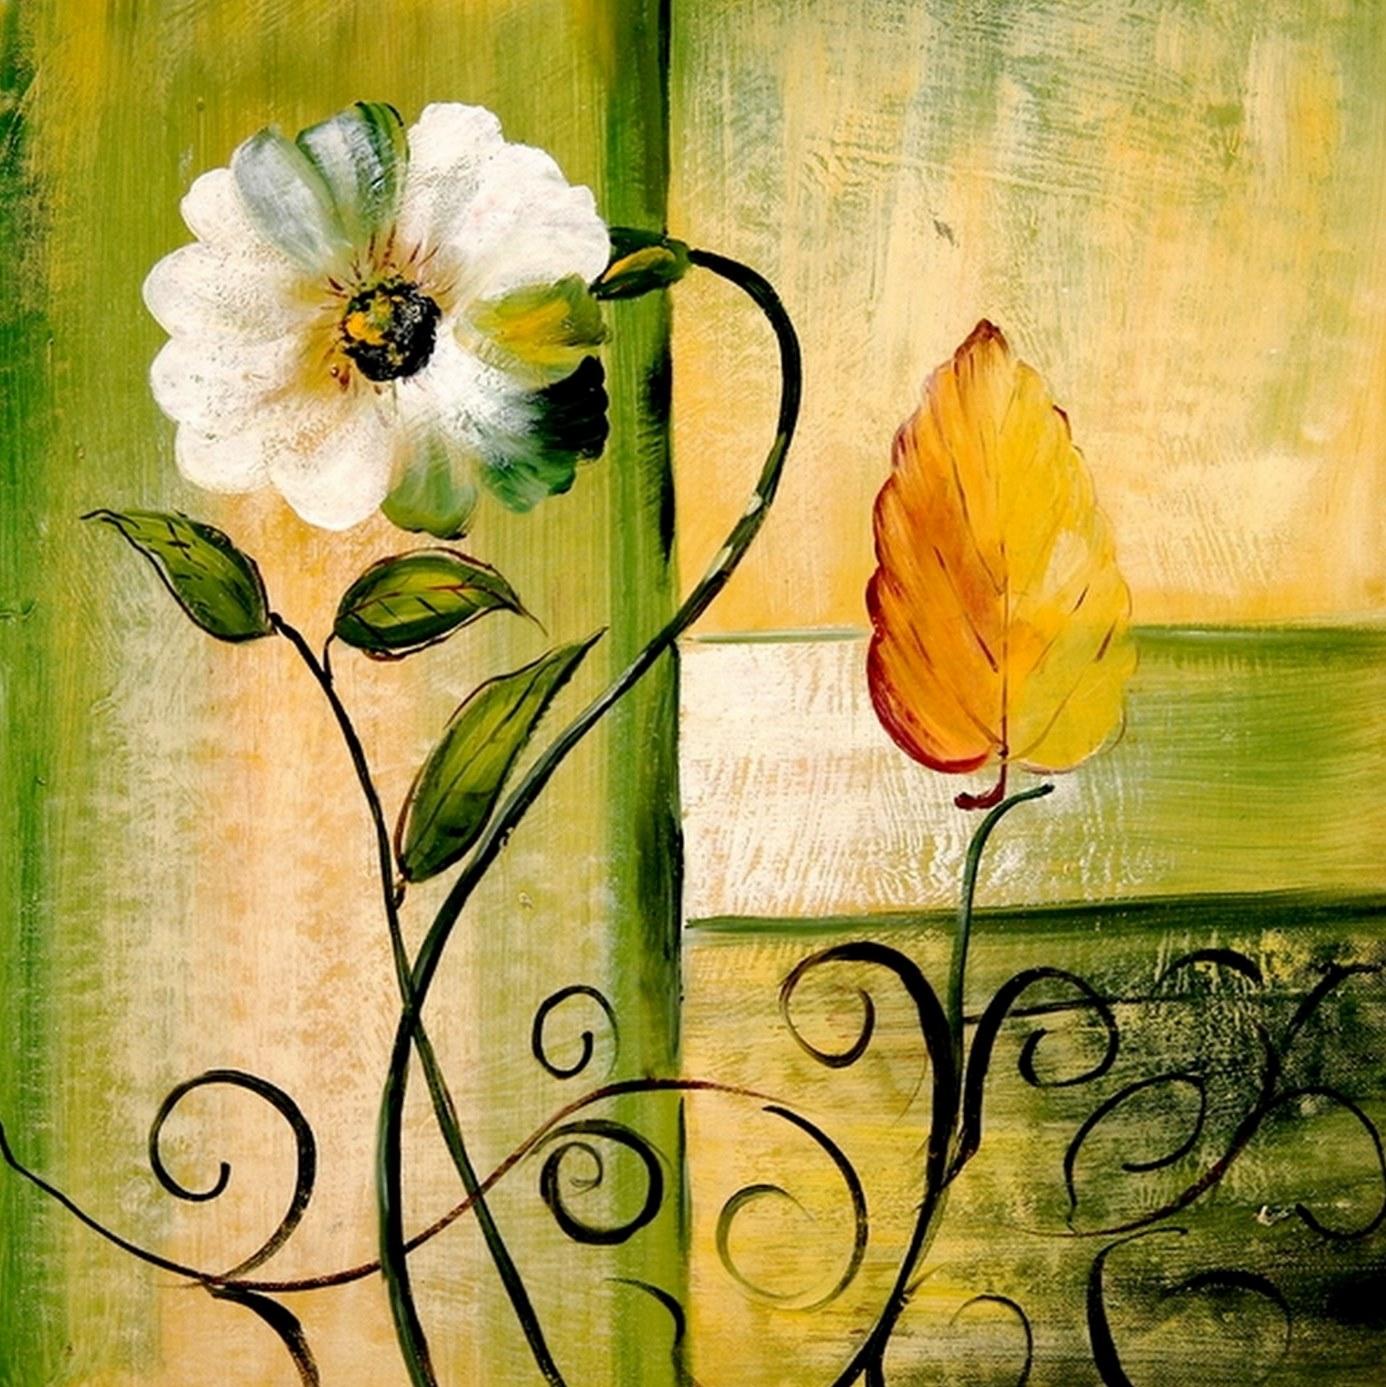 Cuadros pinturas oleos flores al leo modernas - Pintura comedor moderno ...